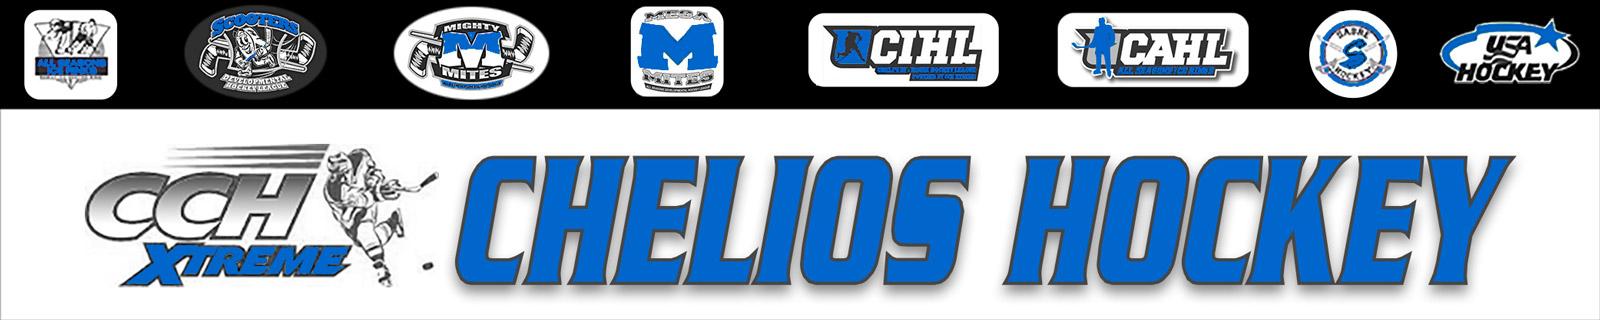 Chelios Hockey, Ice Hockey, Goal, All Seasons Ice Rink